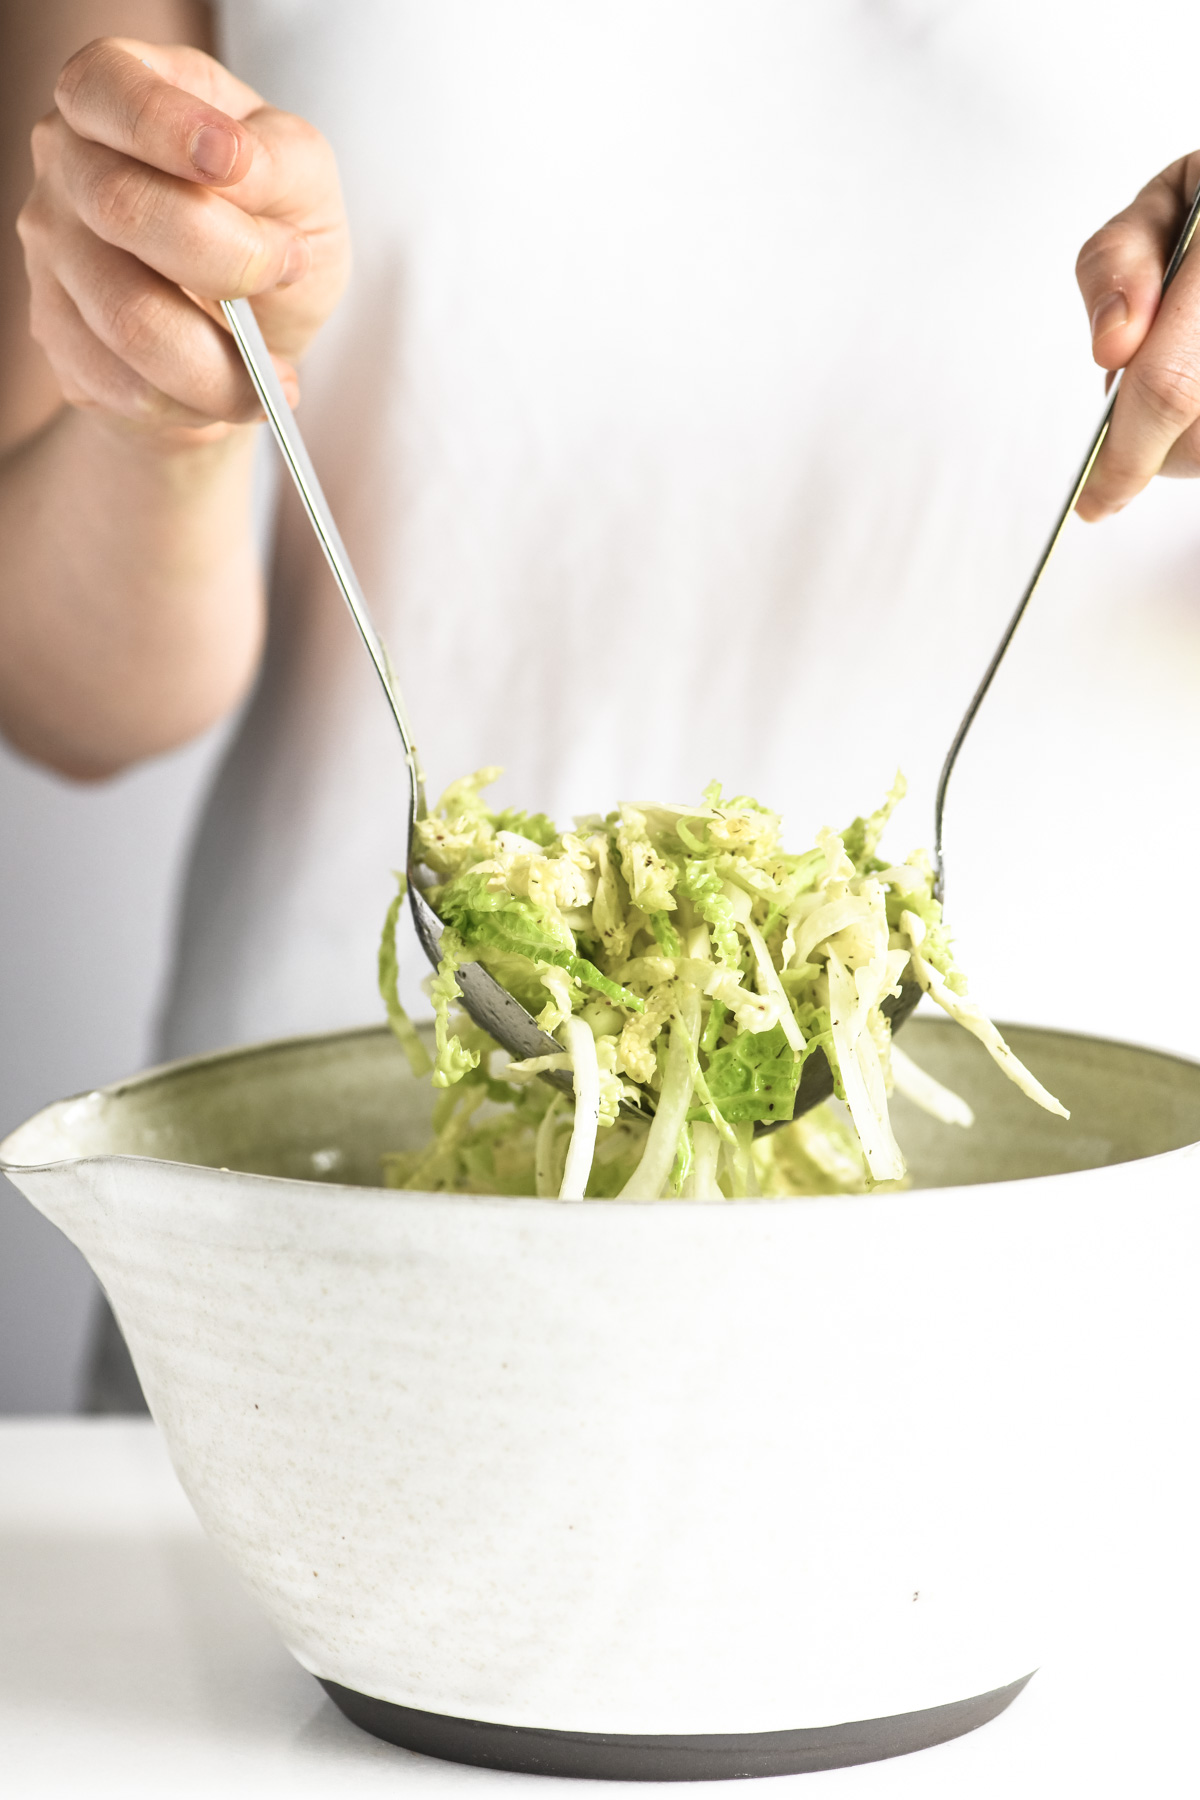 tossing vinegar based coleslaw